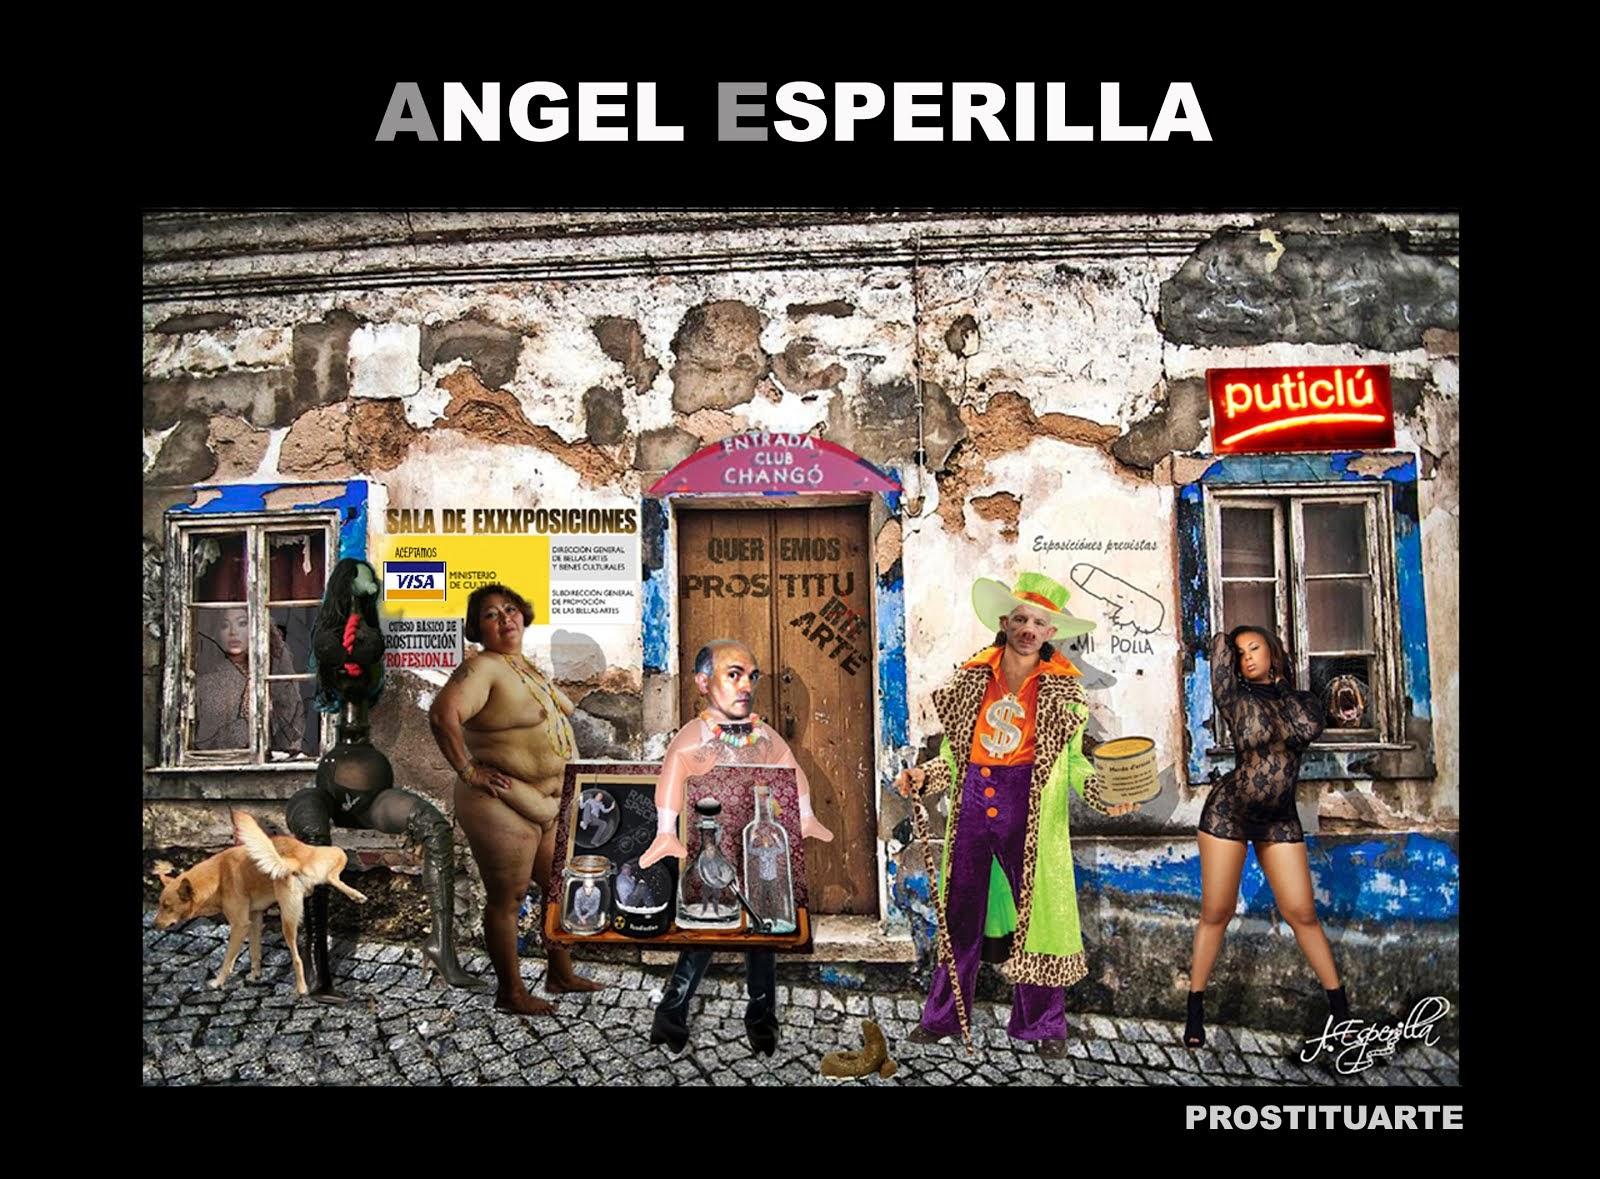 ANGEL ESPERILLA